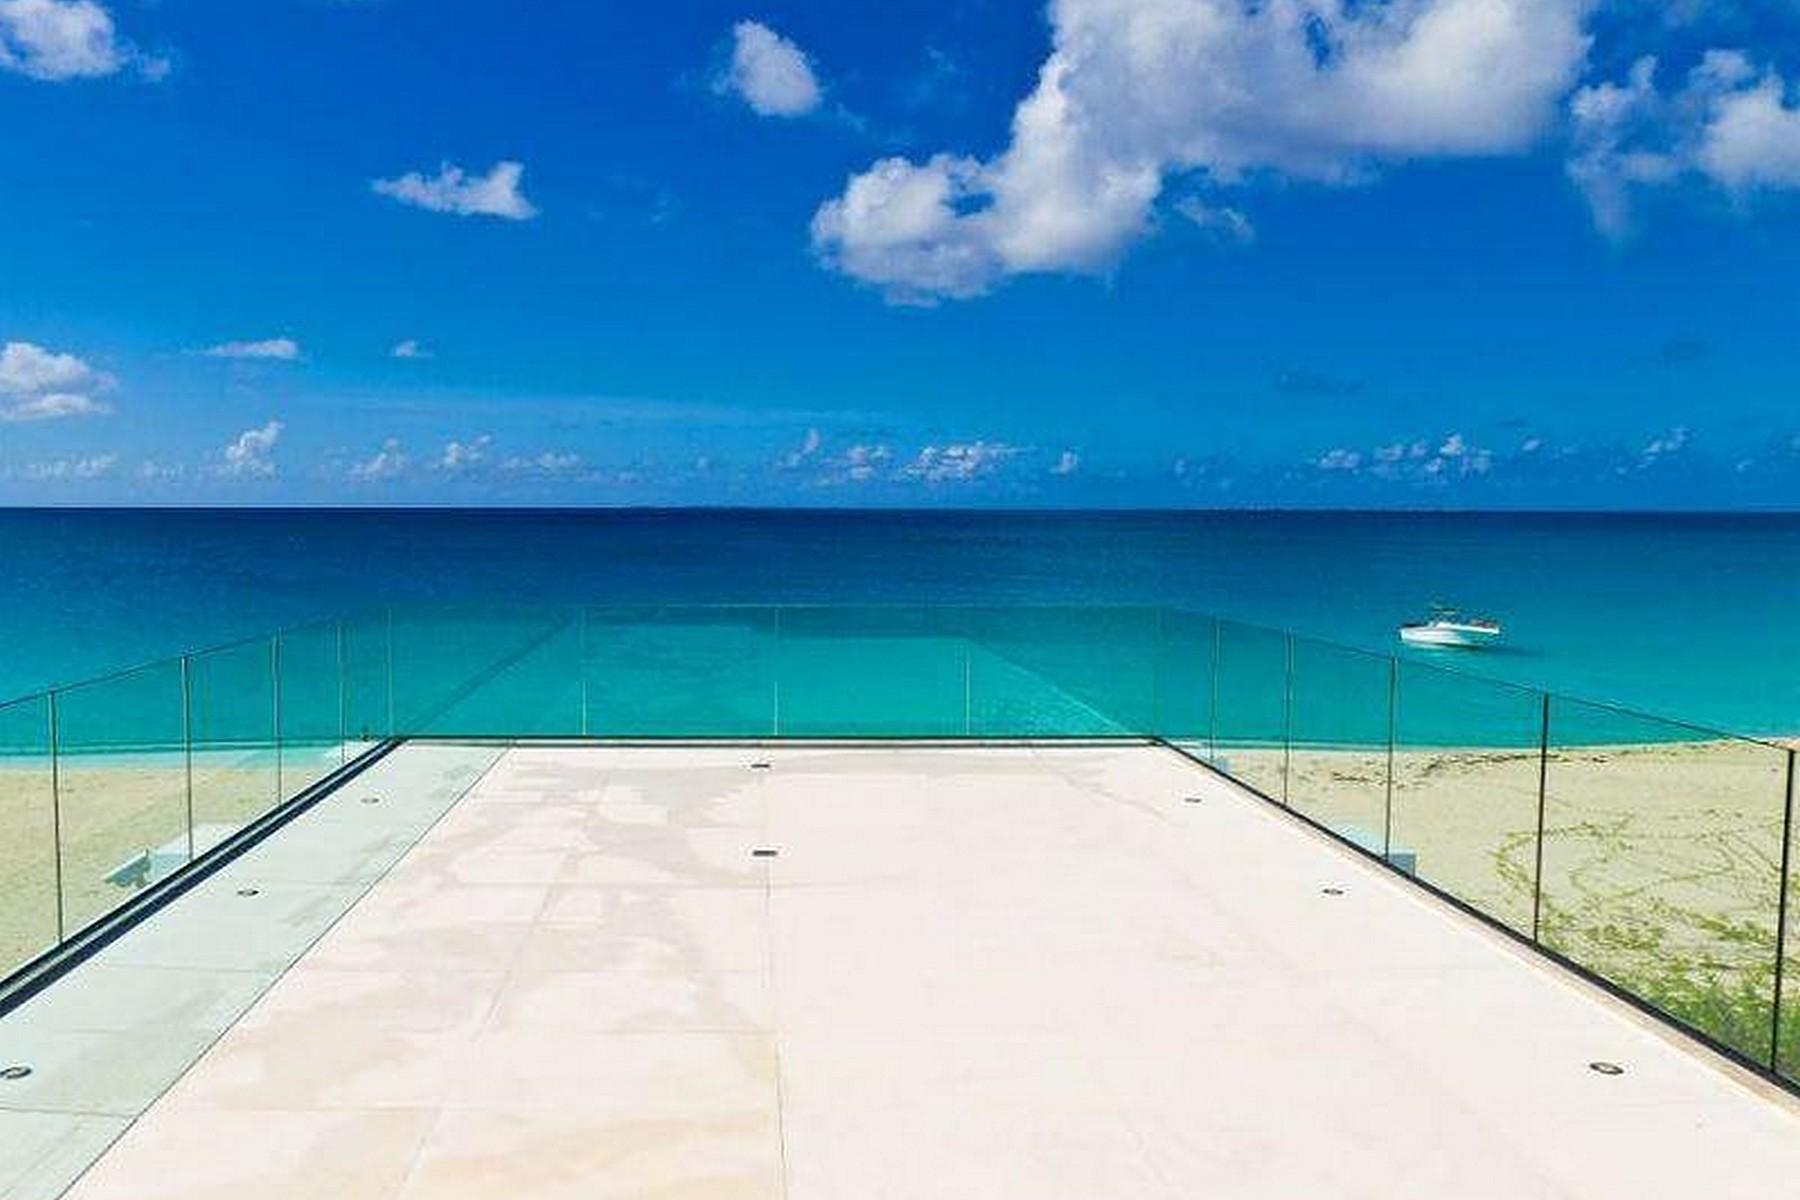 Частный односемейный дом для того Продажа на The Beach House Meads Bay Meads Bay, AI 2640 Ангилья